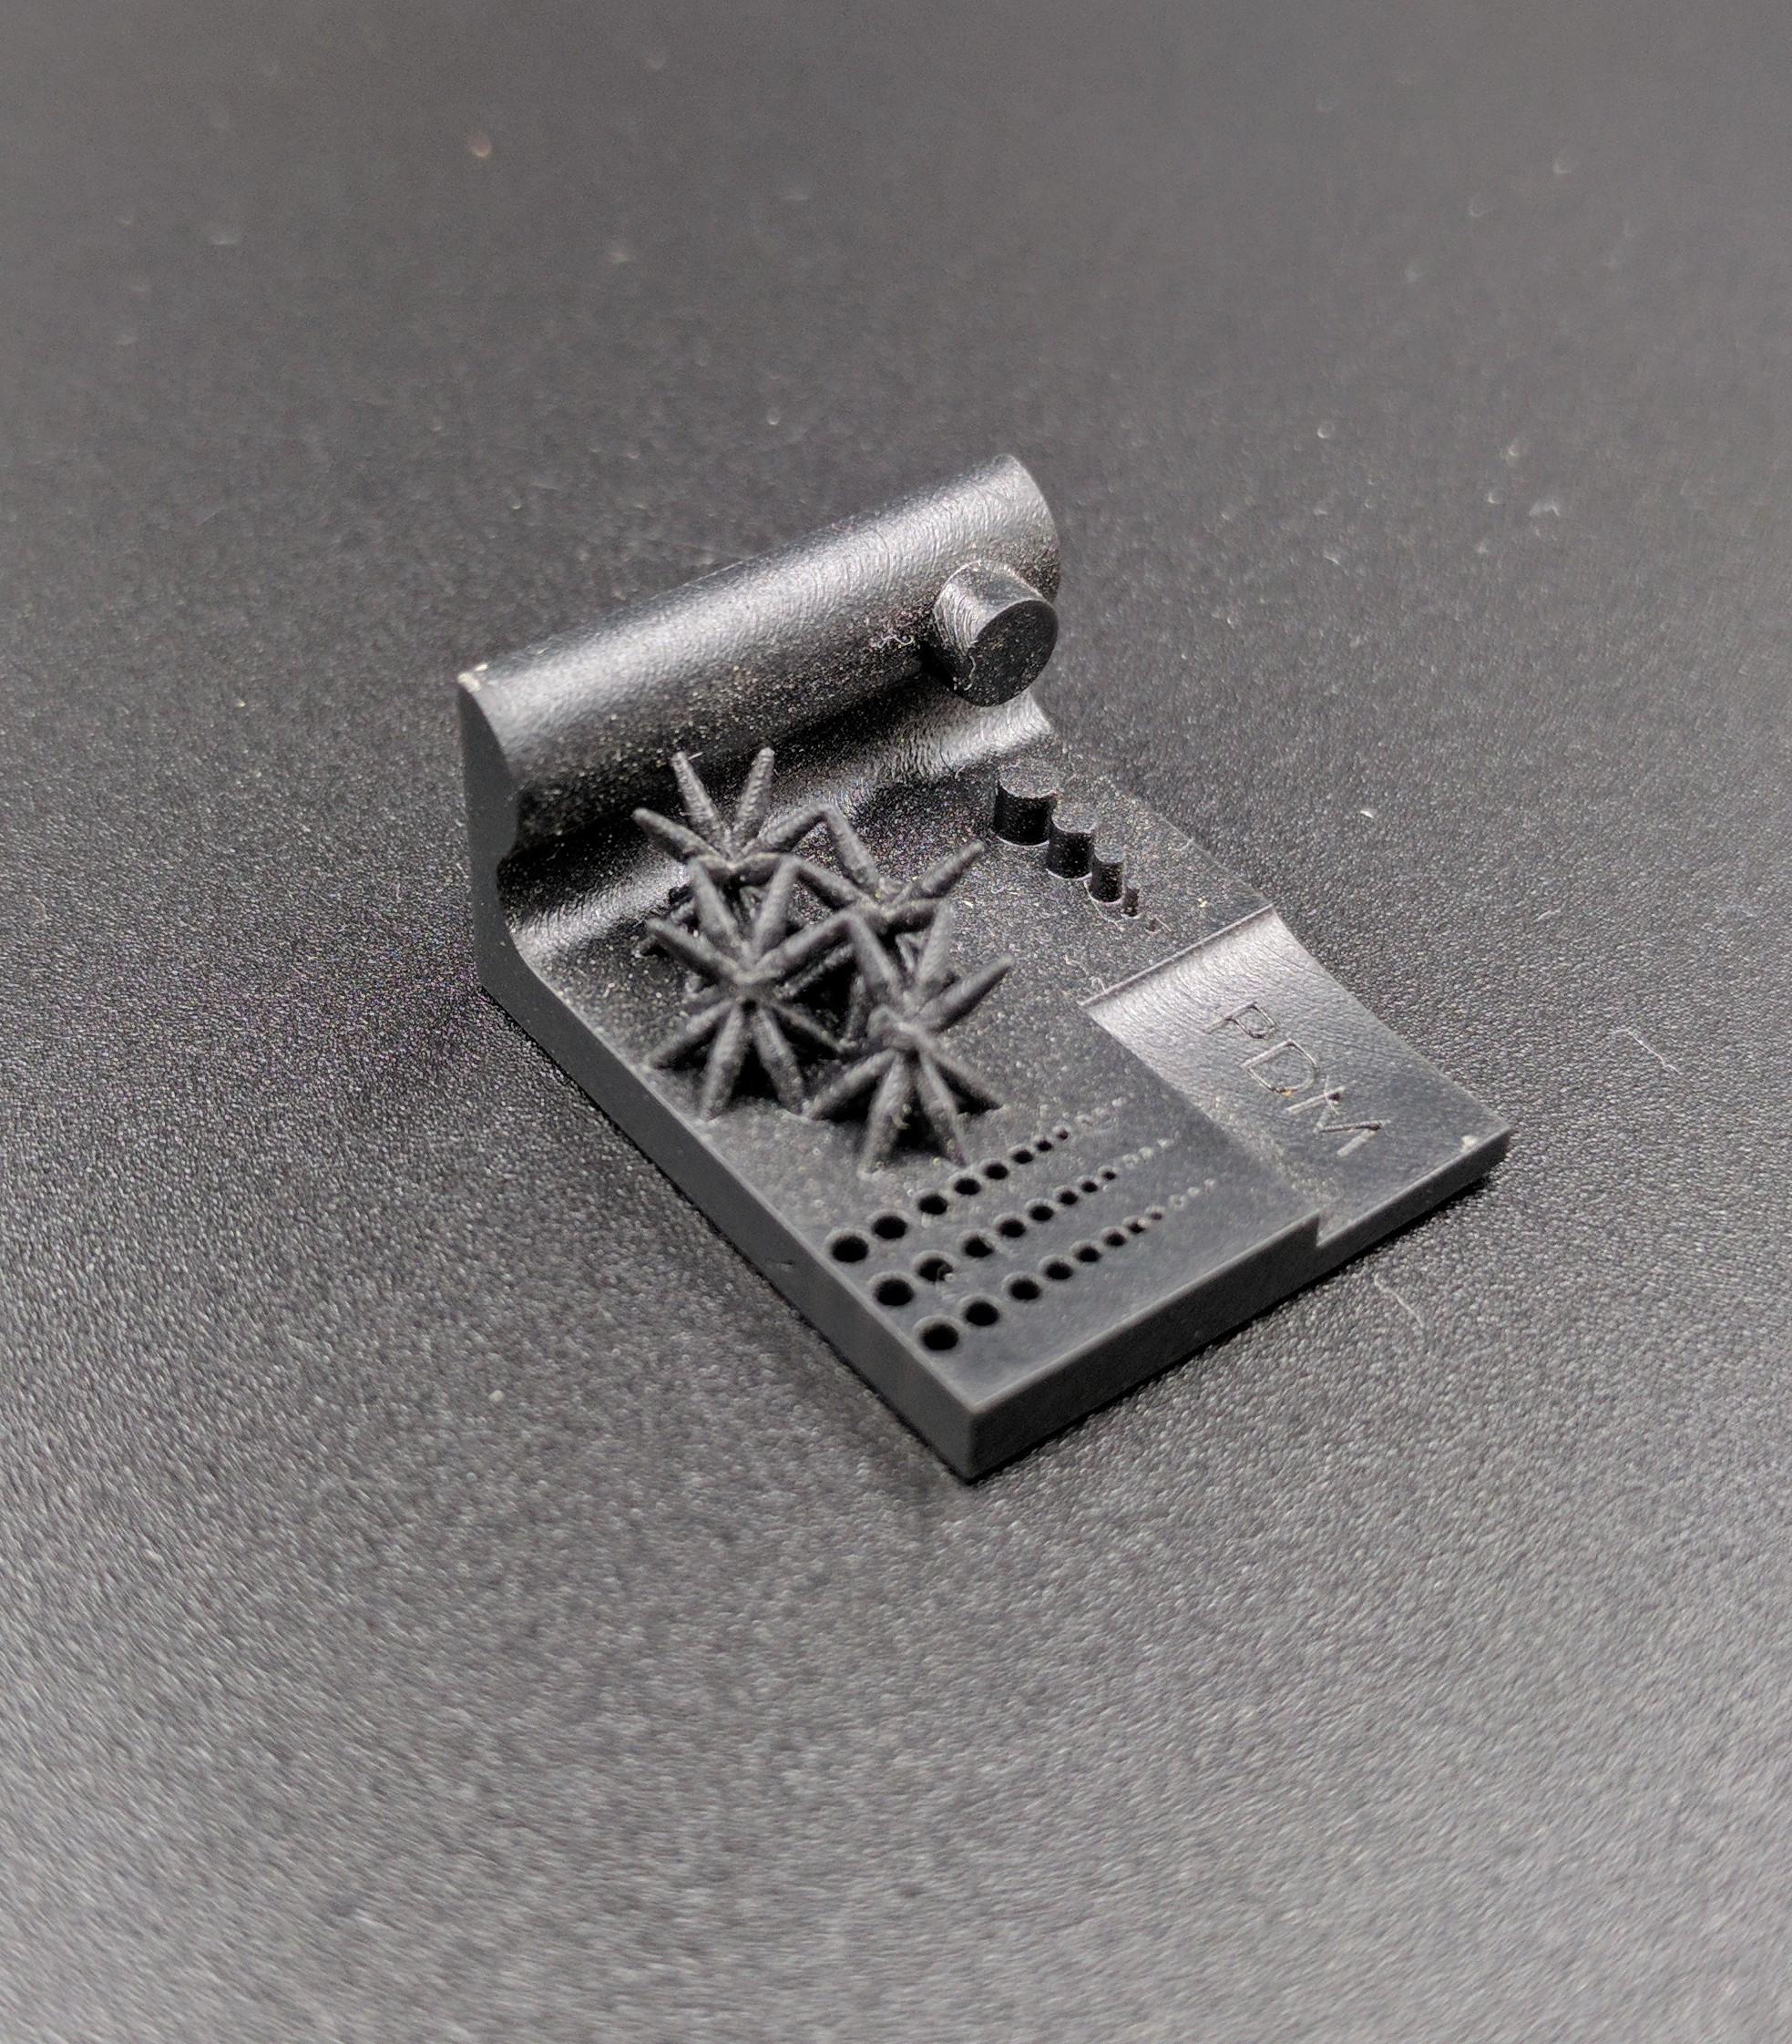 3D Printing SLA test print 3